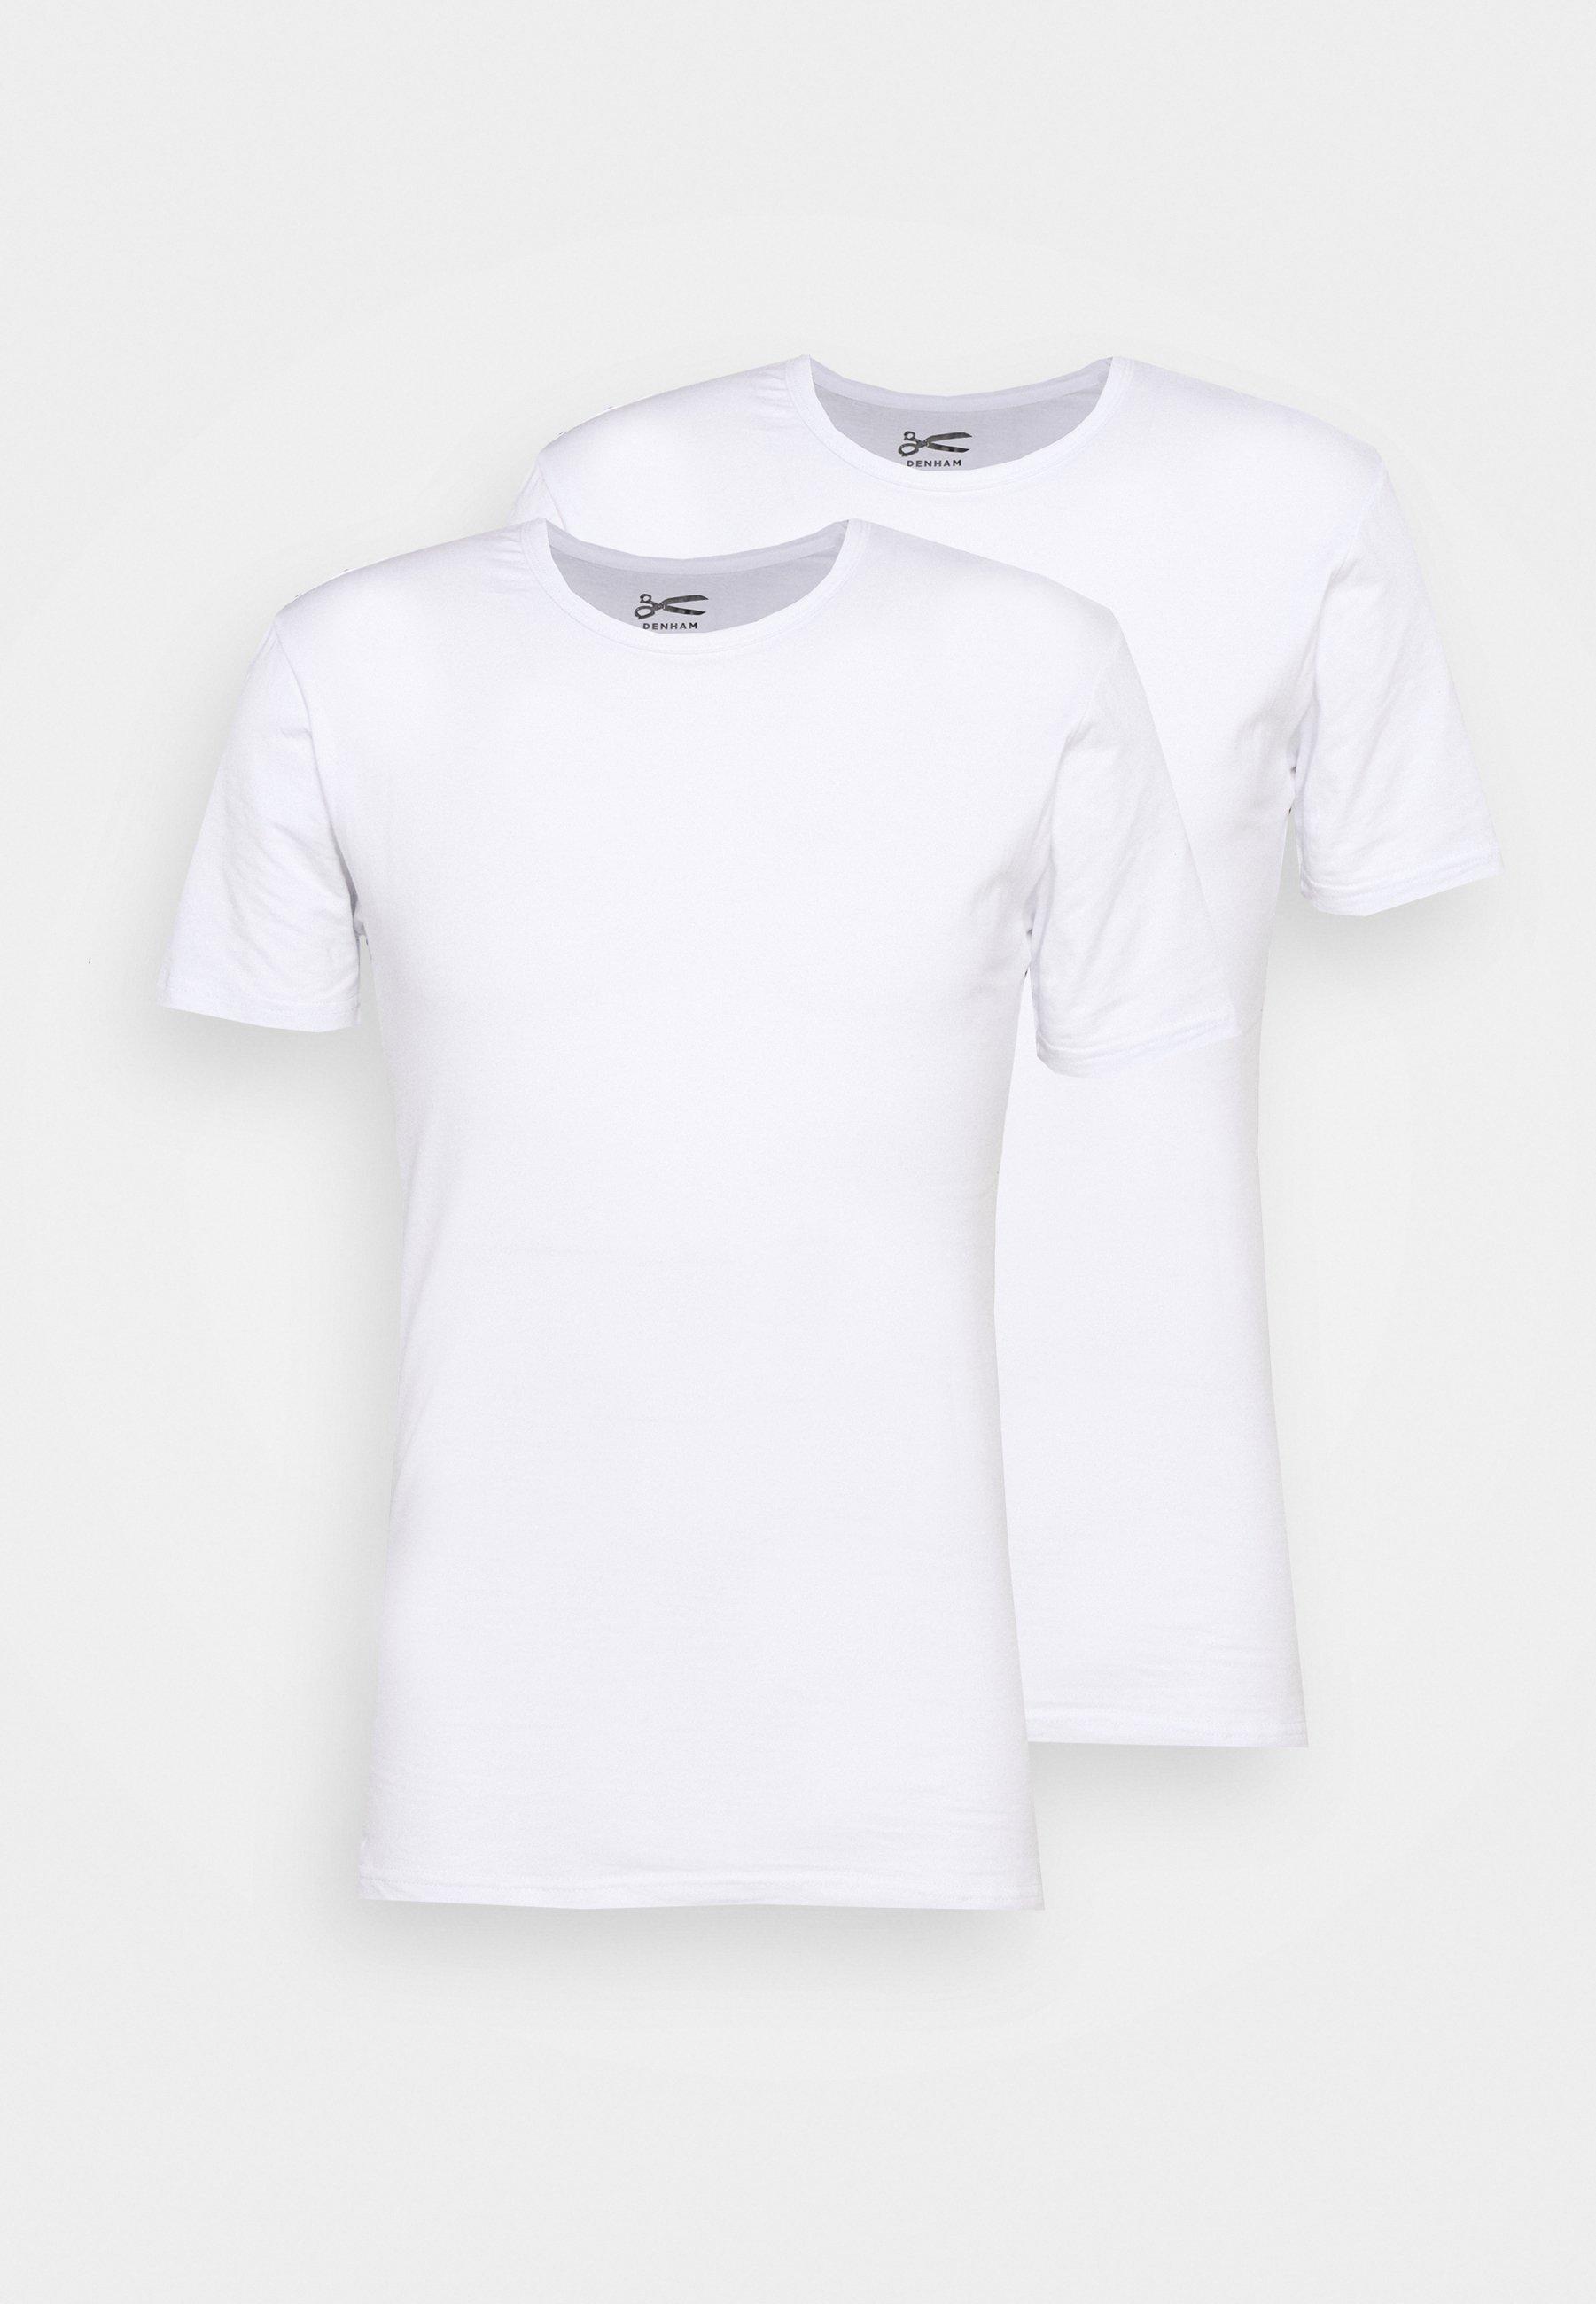 Homme UNDERWEAR BACO 2 PACK - T-shirt basique